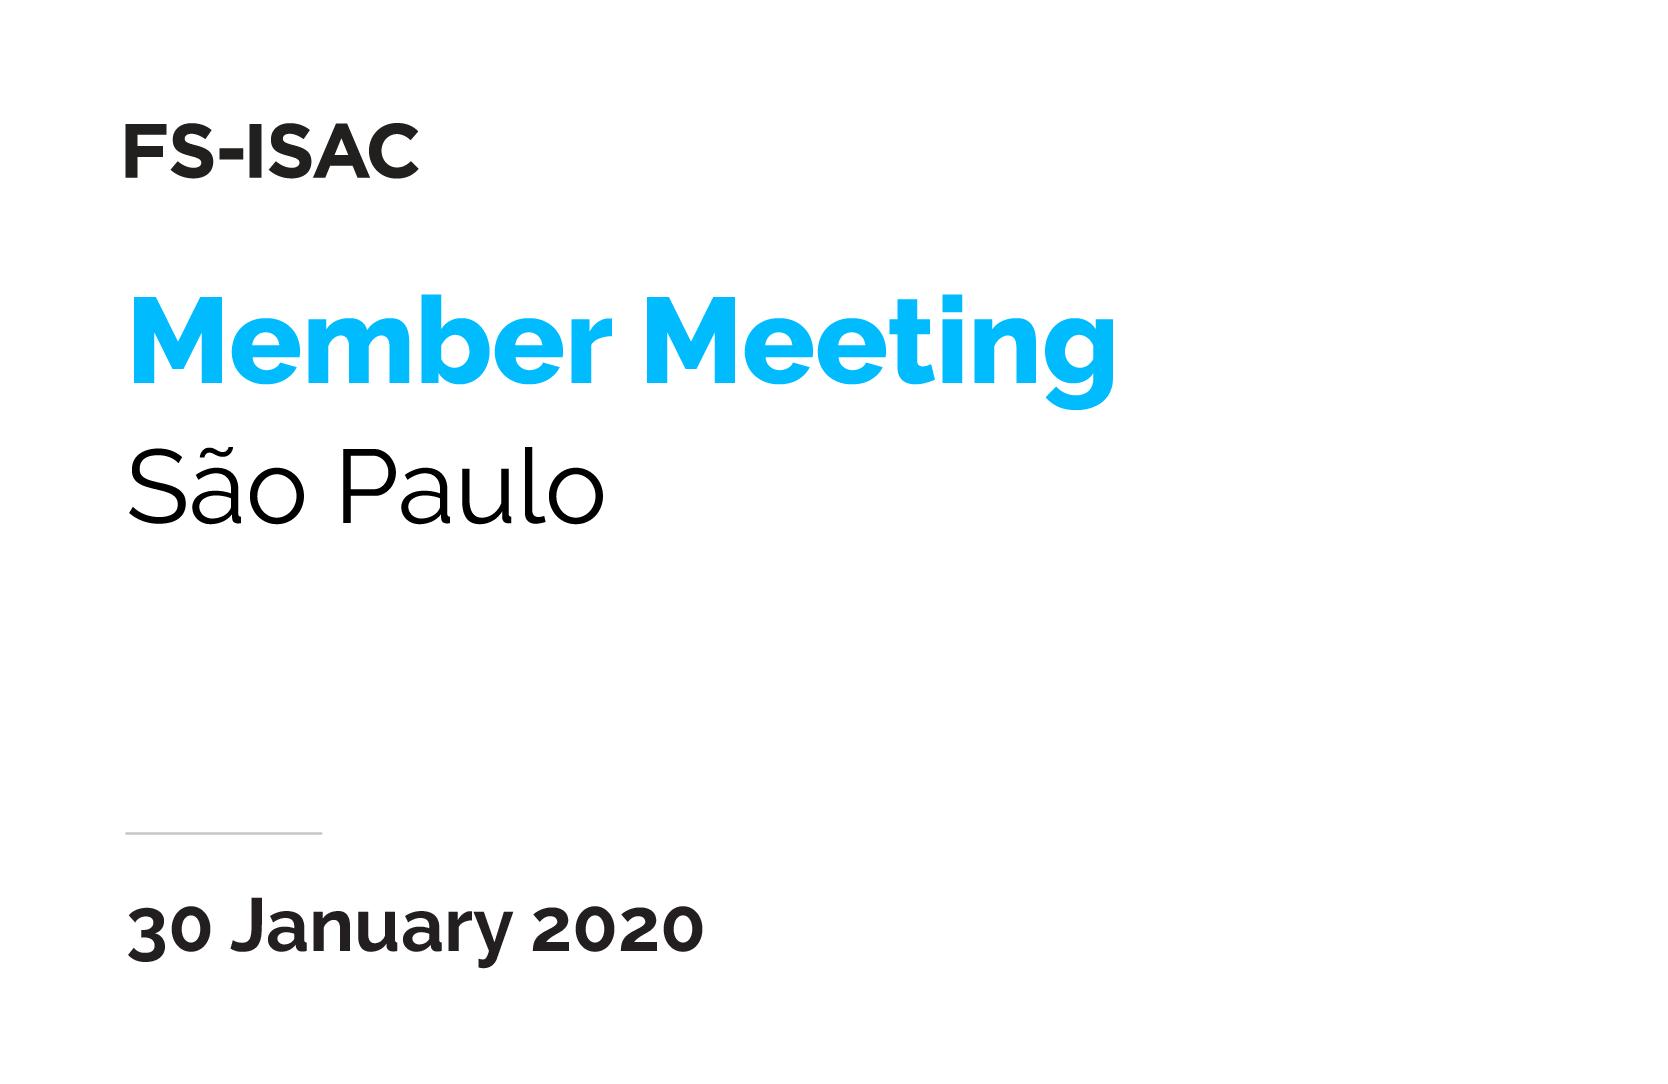 Sao Paulo Member Meeting